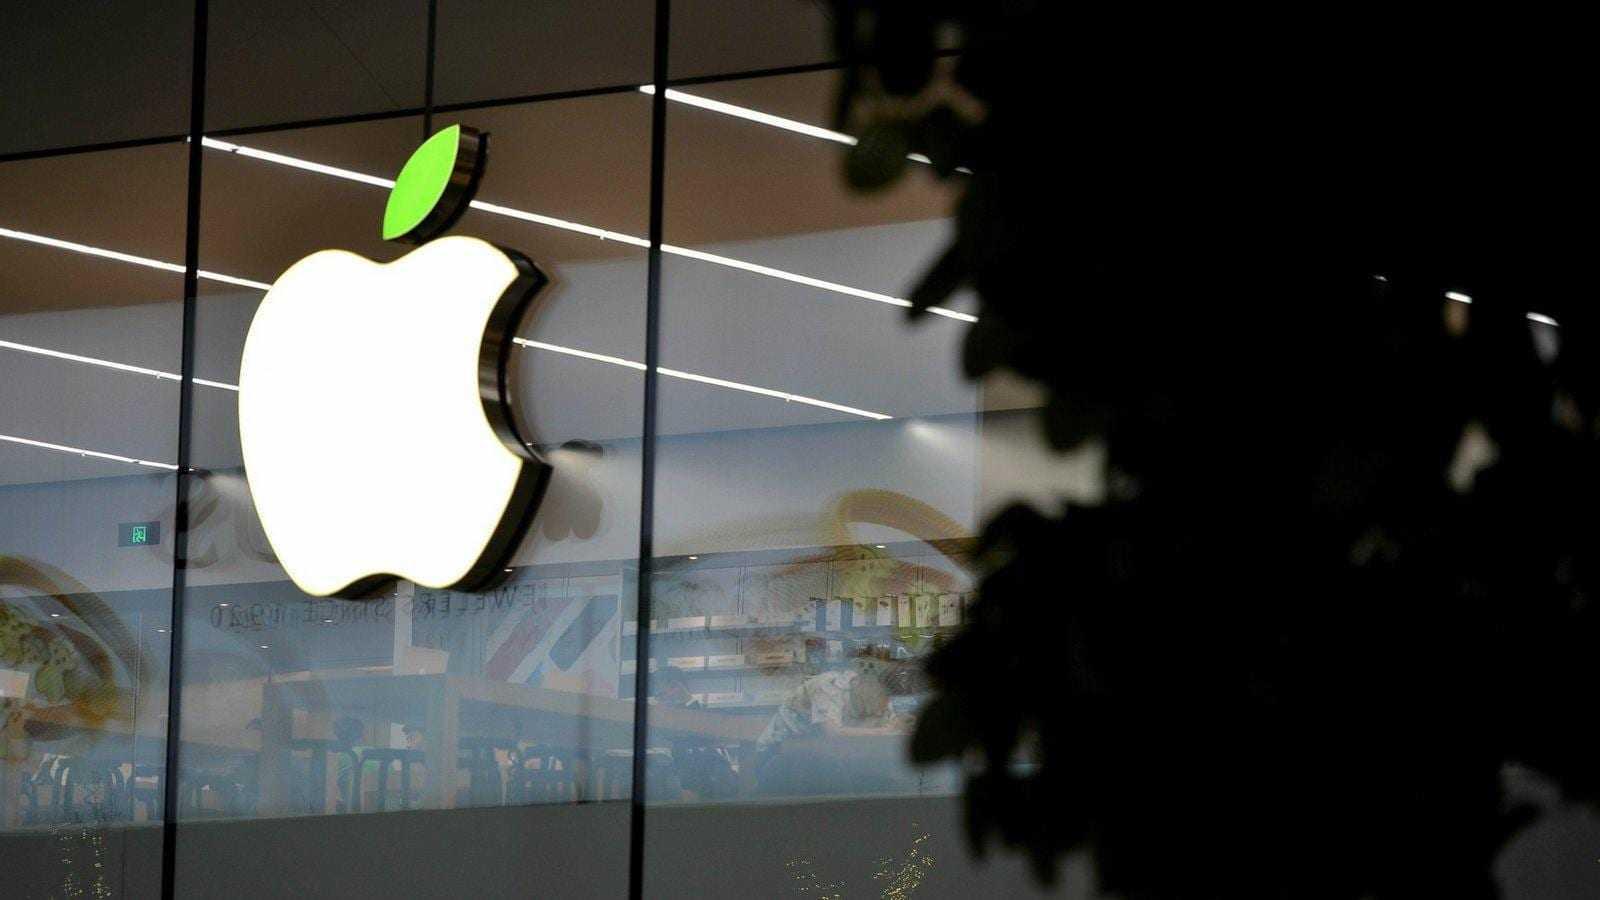 Чего ожидать от презентации Apple на WWDC 2019? (Green Apple)